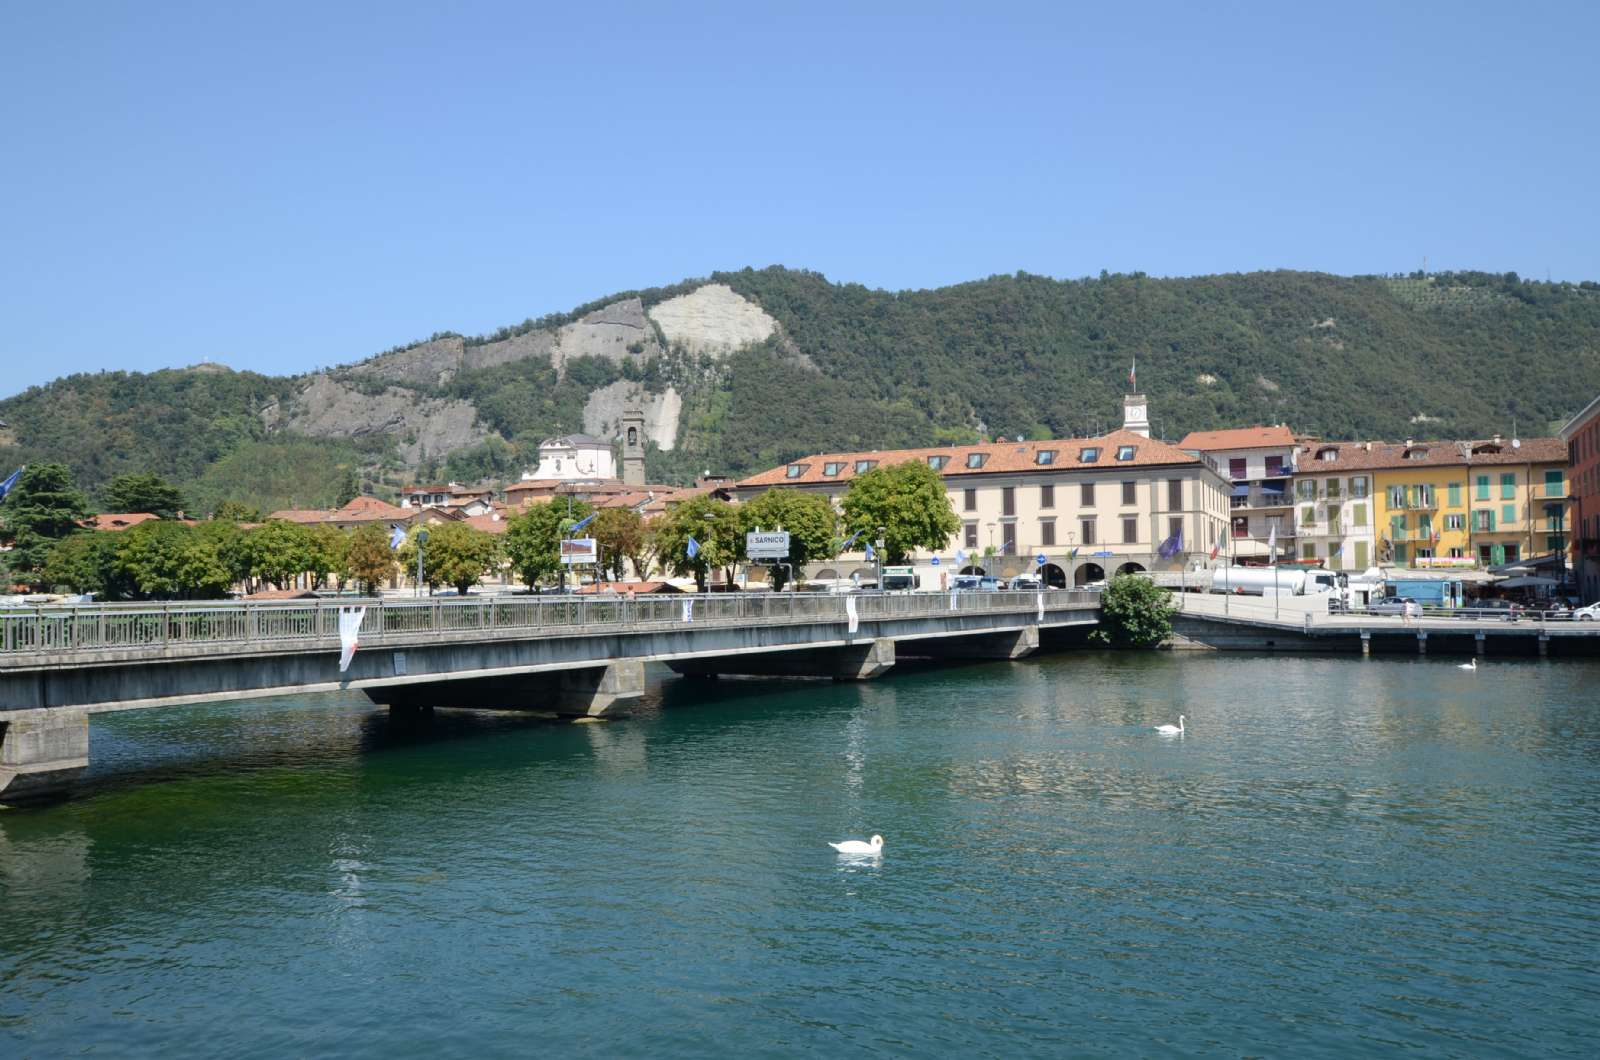 Broen som forbinder Paratico og Sarnico